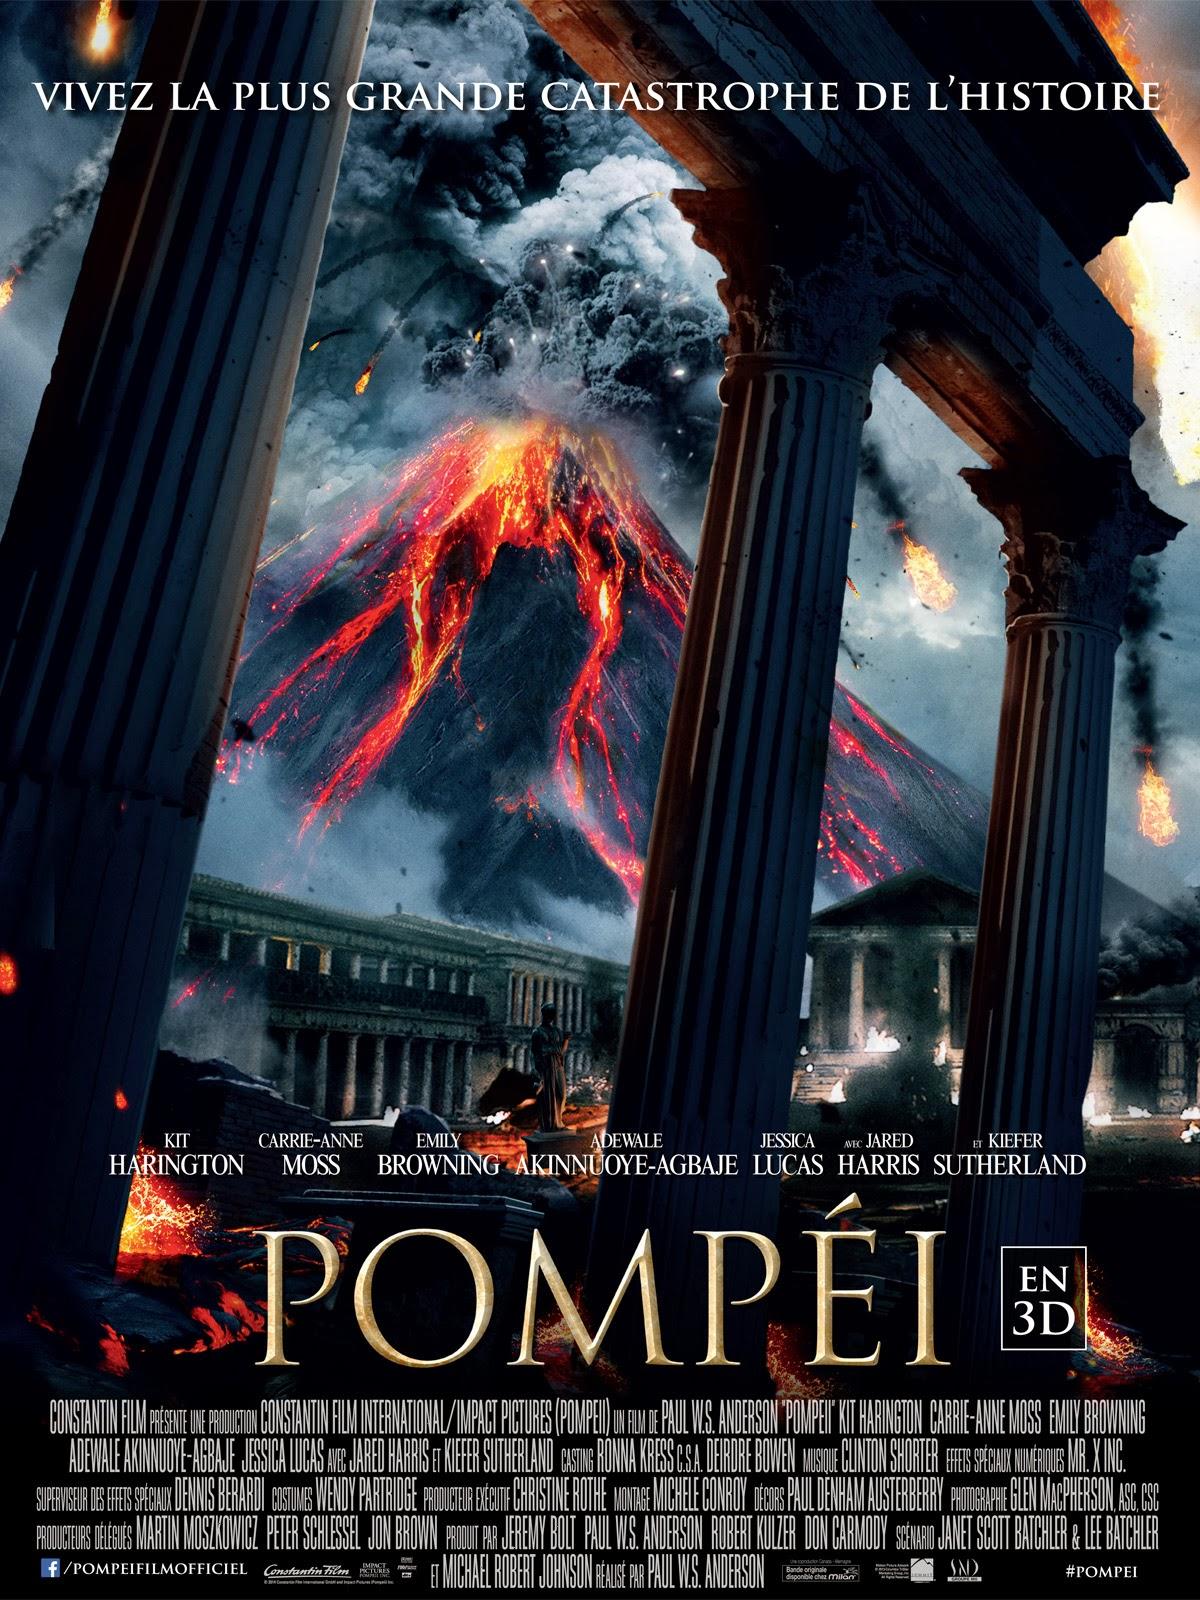 http://fuckingcinephiles.blogspot.fr/2014/02/critique-pompei.html